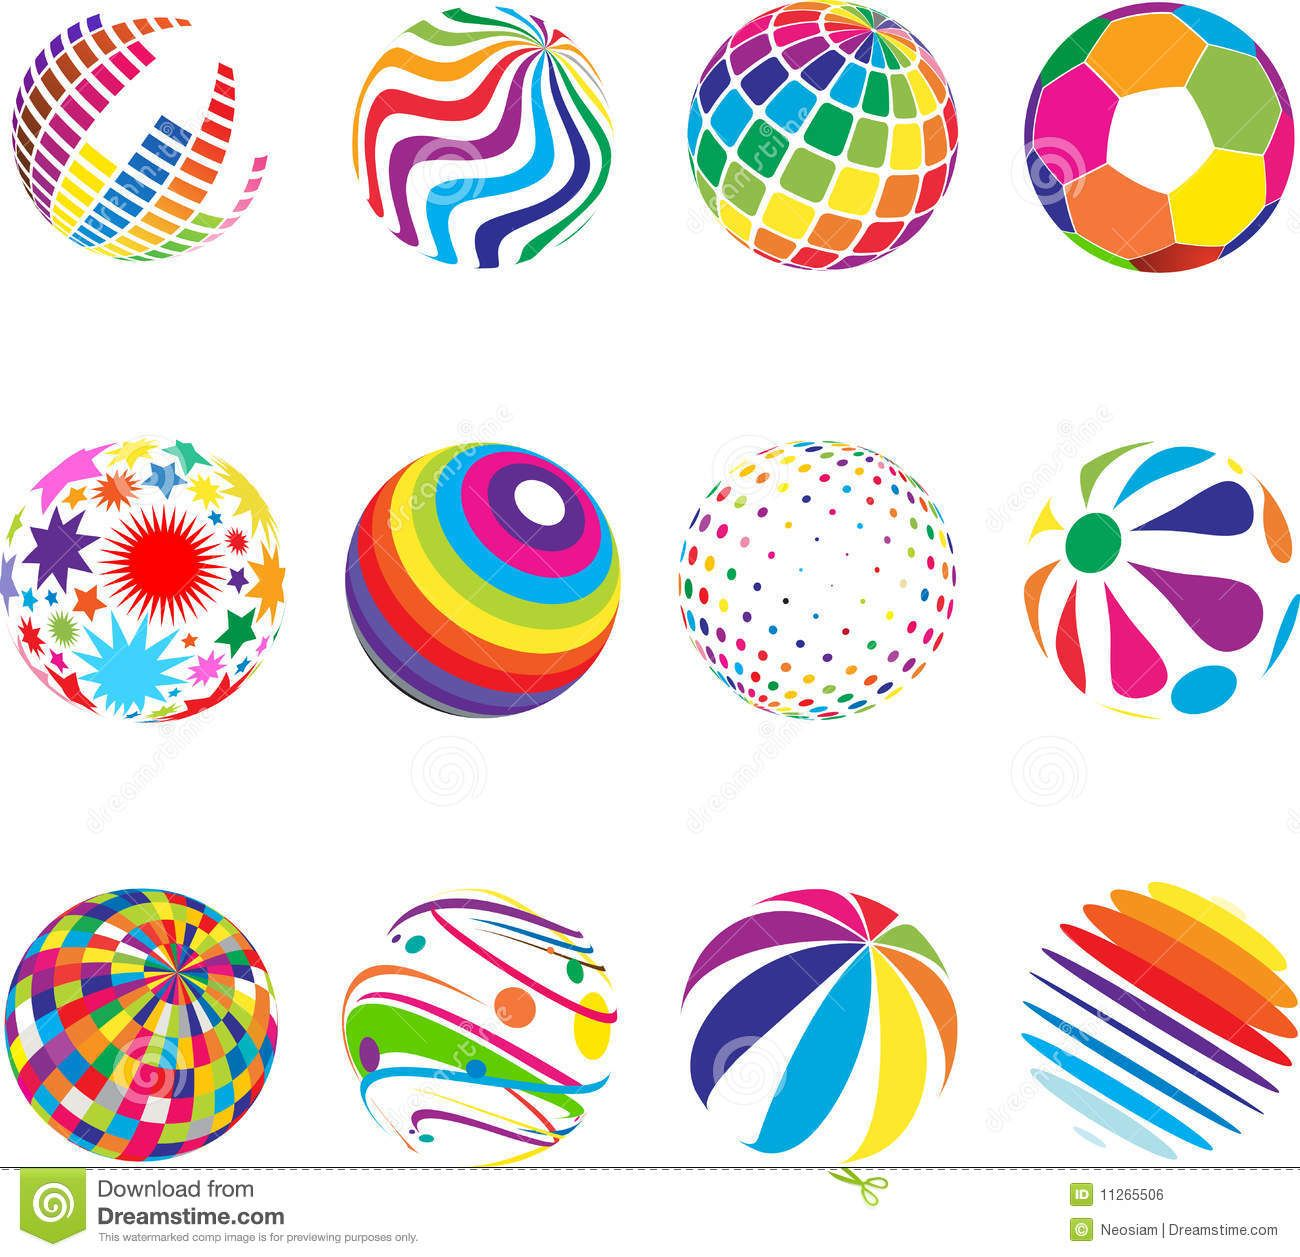 logos logo designs pinterest